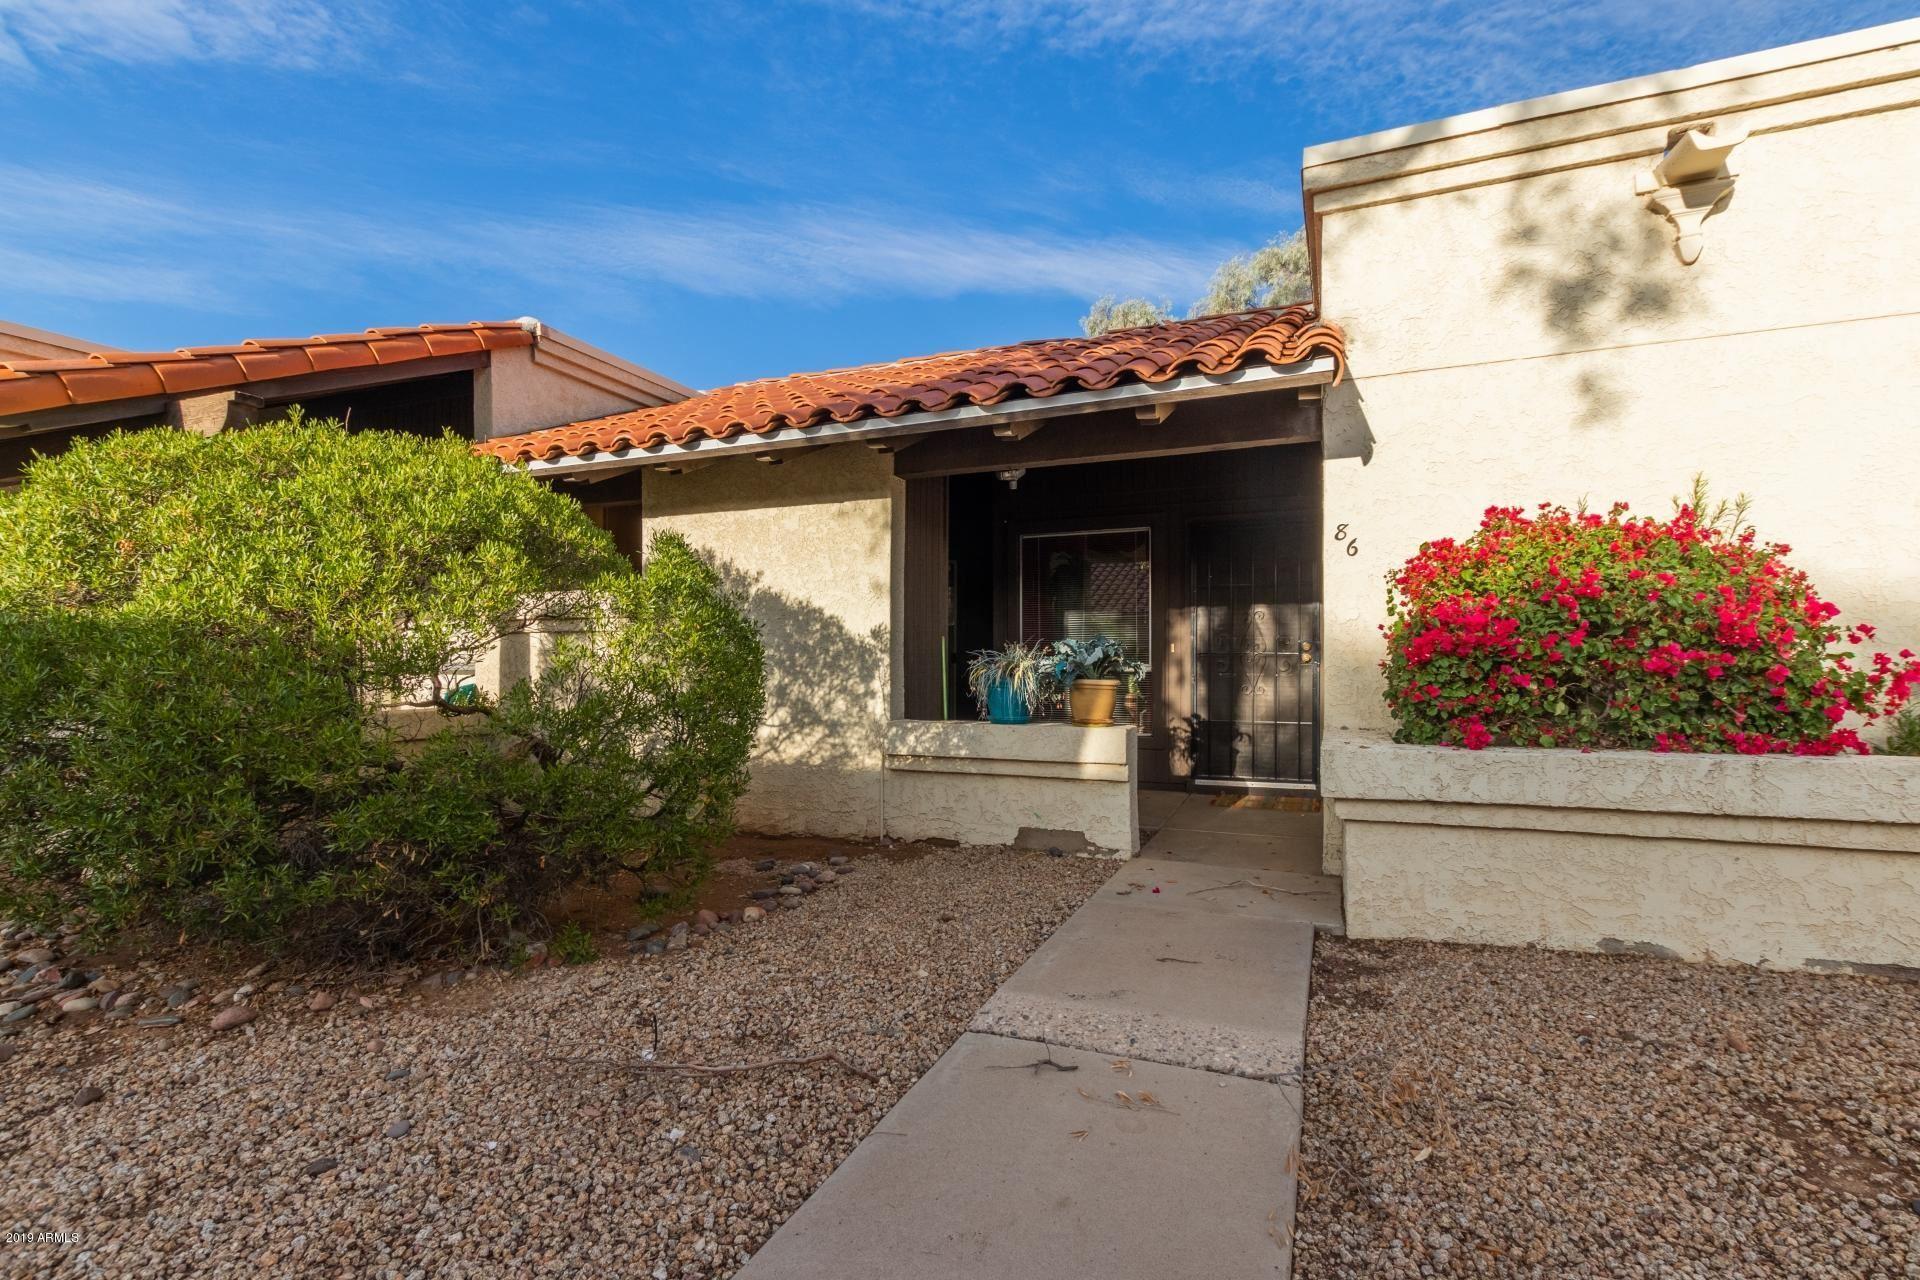 4820 N 89TH Avenue #86, Phoenix, AZ 85037 - #: 6051321